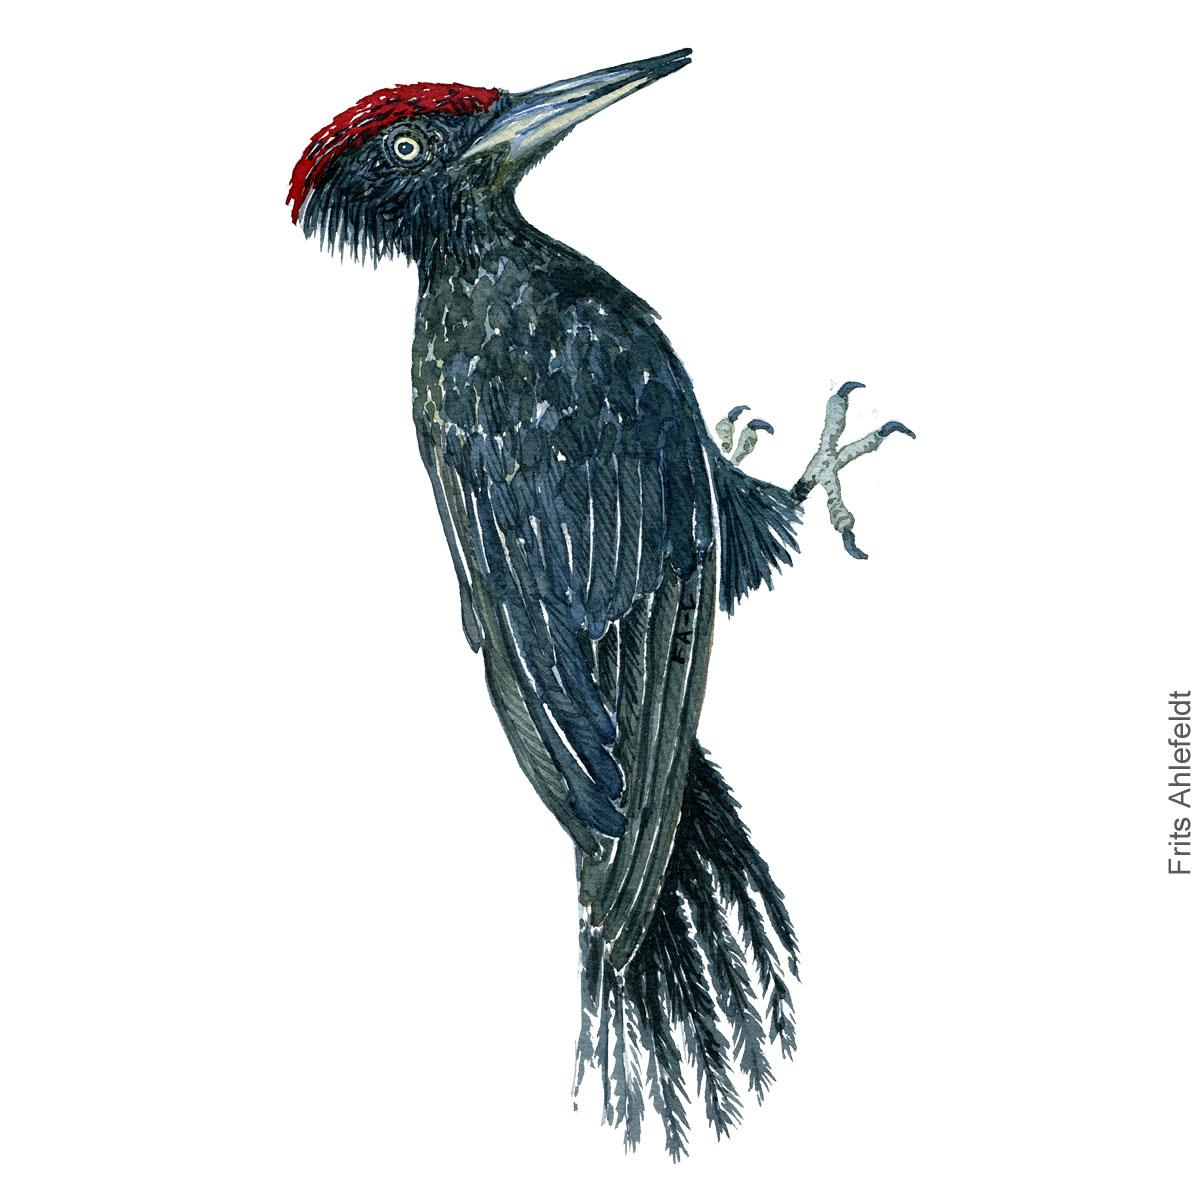 Black woodpecker - Sortspætte akvarel. Watercolor painting by Frits Ahlefeldt